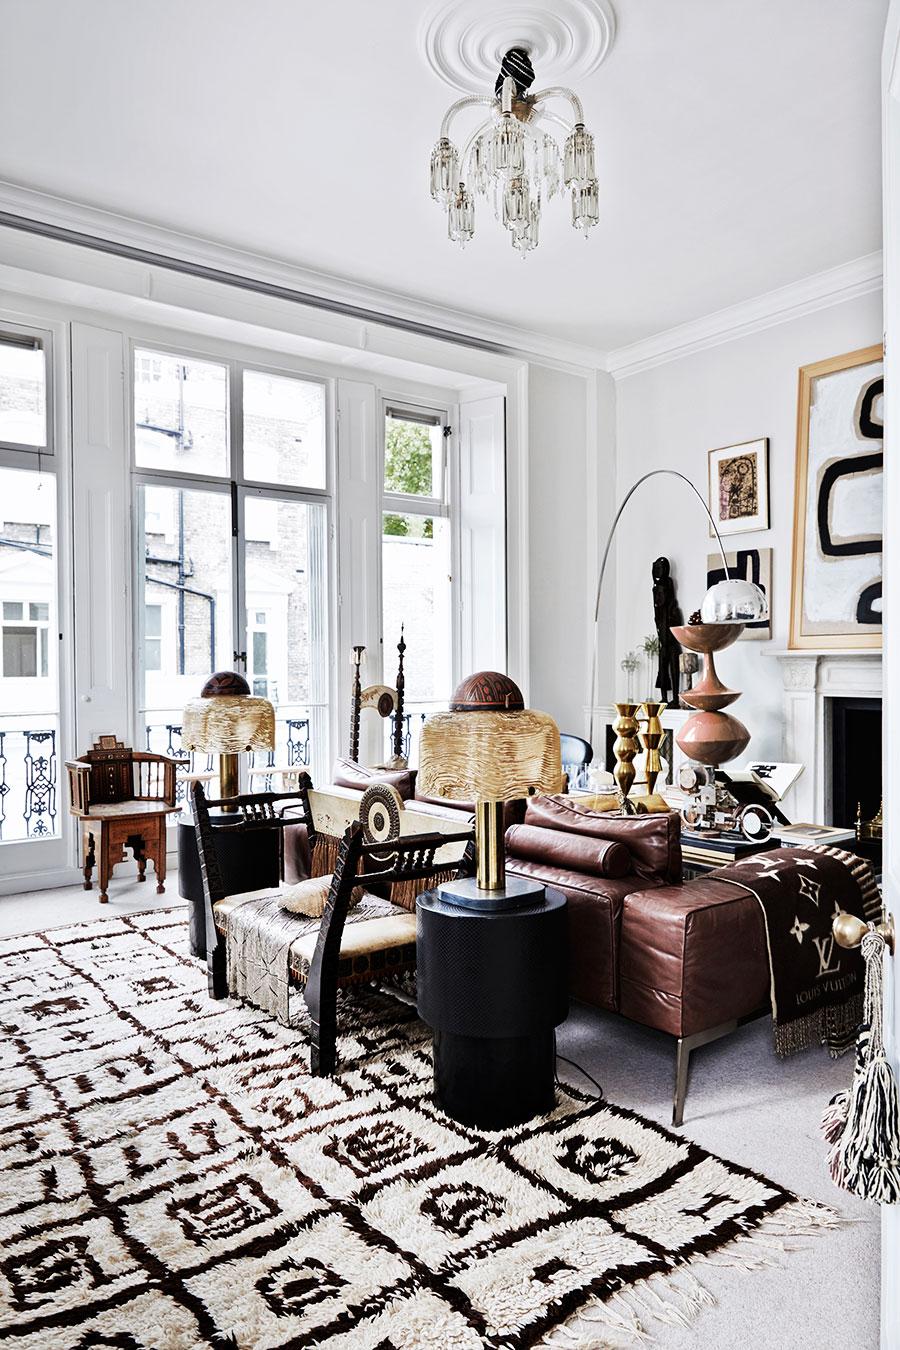 amazing boho chic interior in london by malene birger. Black Bedroom Furniture Sets. Home Design Ideas